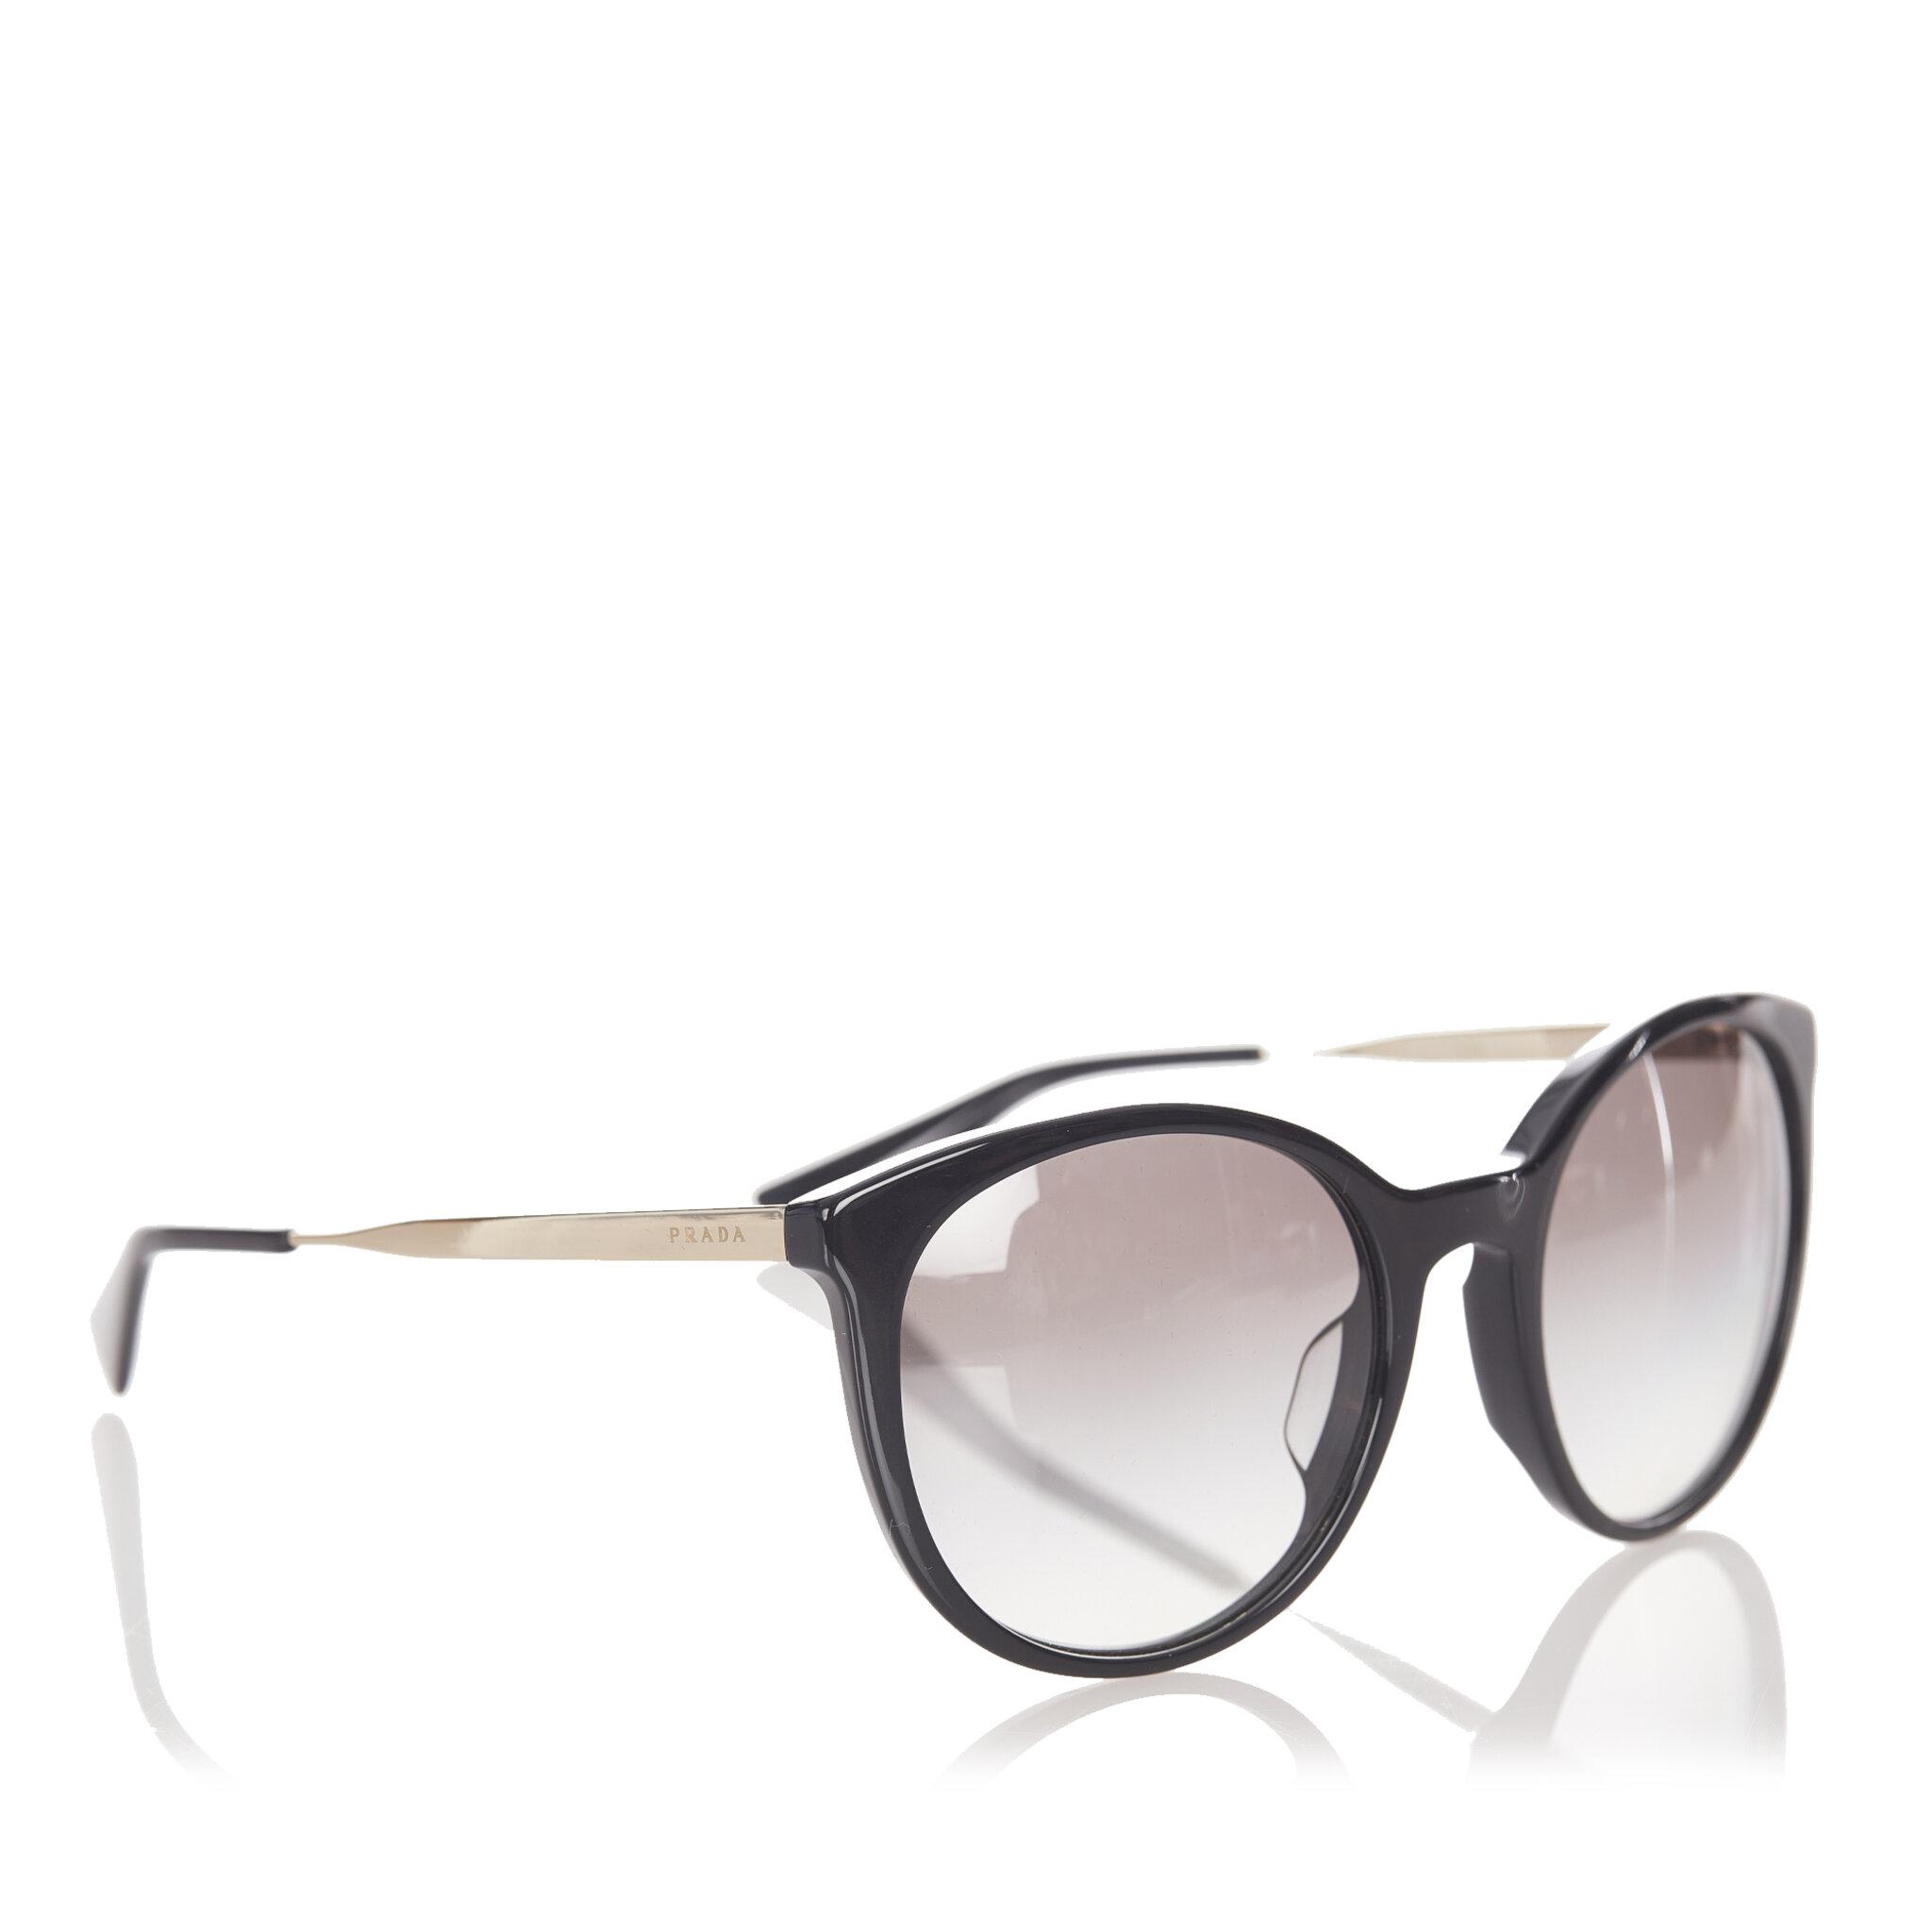 Prada Cinema Round Tinted Sunglasses, ONESIZE